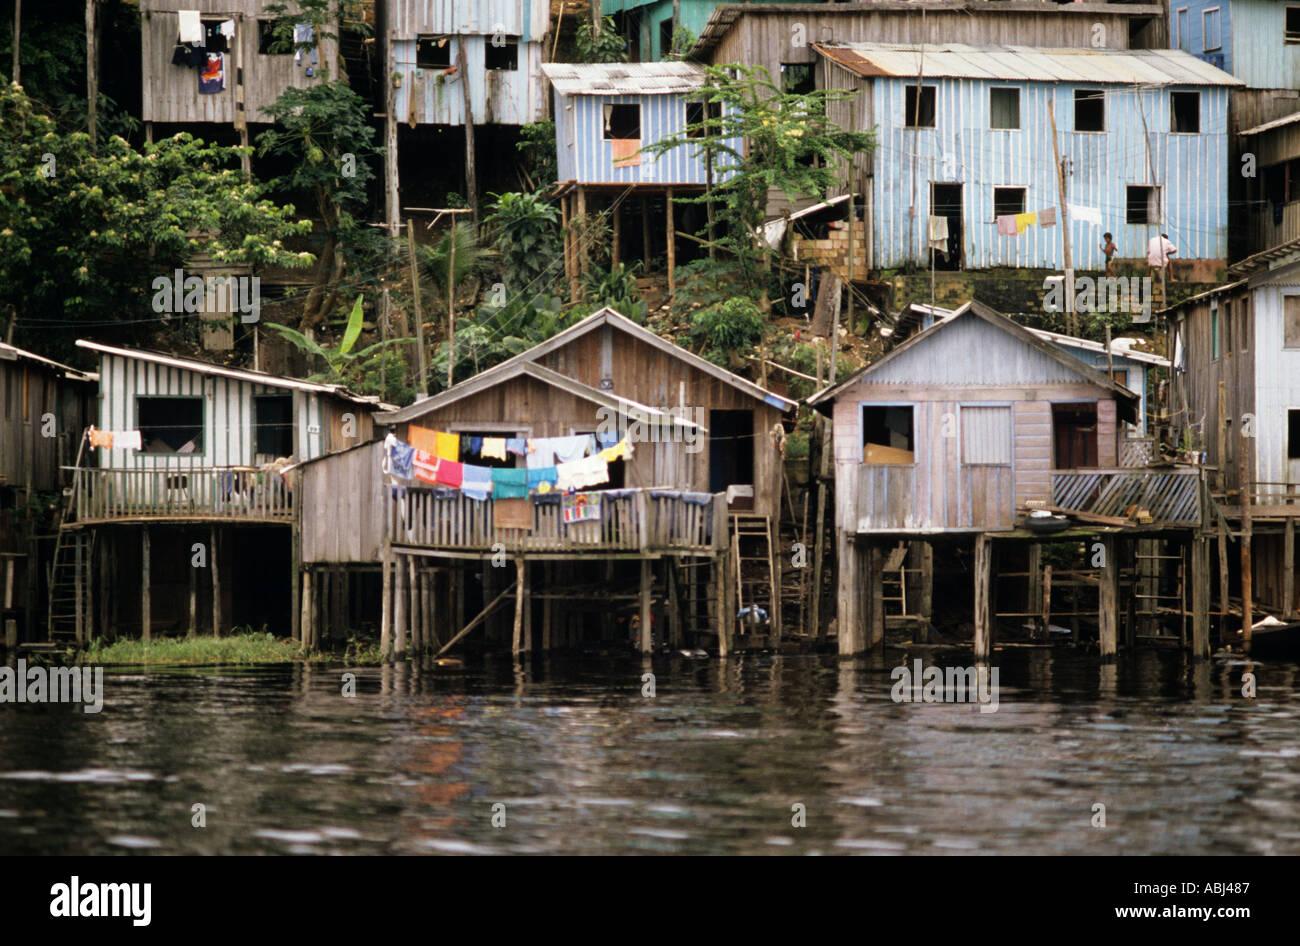 Manaus Brazil Poor Shanty Town Housing Houses Built On